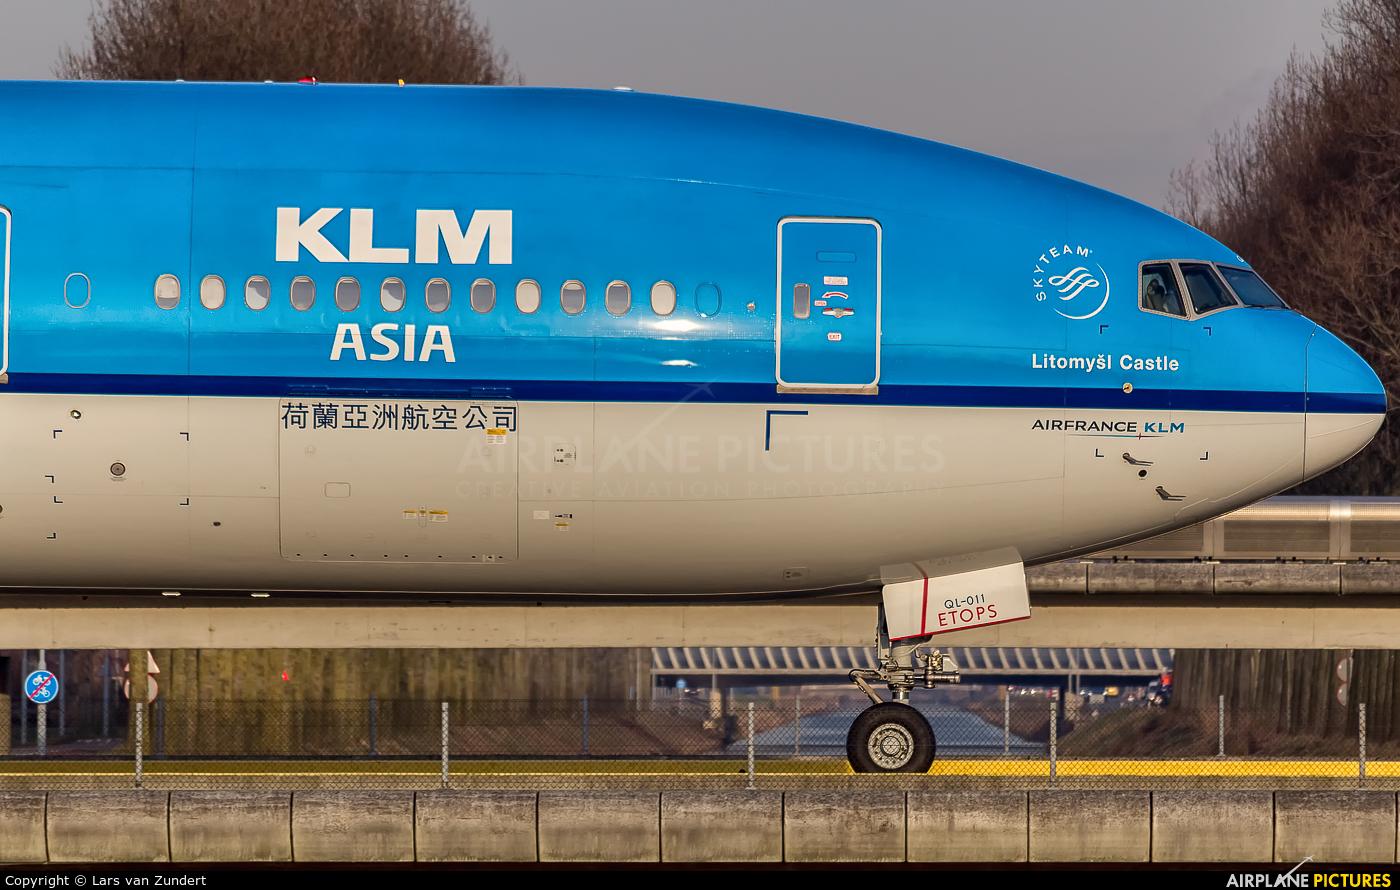 KLM Asia PH-BQL aircraft at Amsterdam - Schiphol